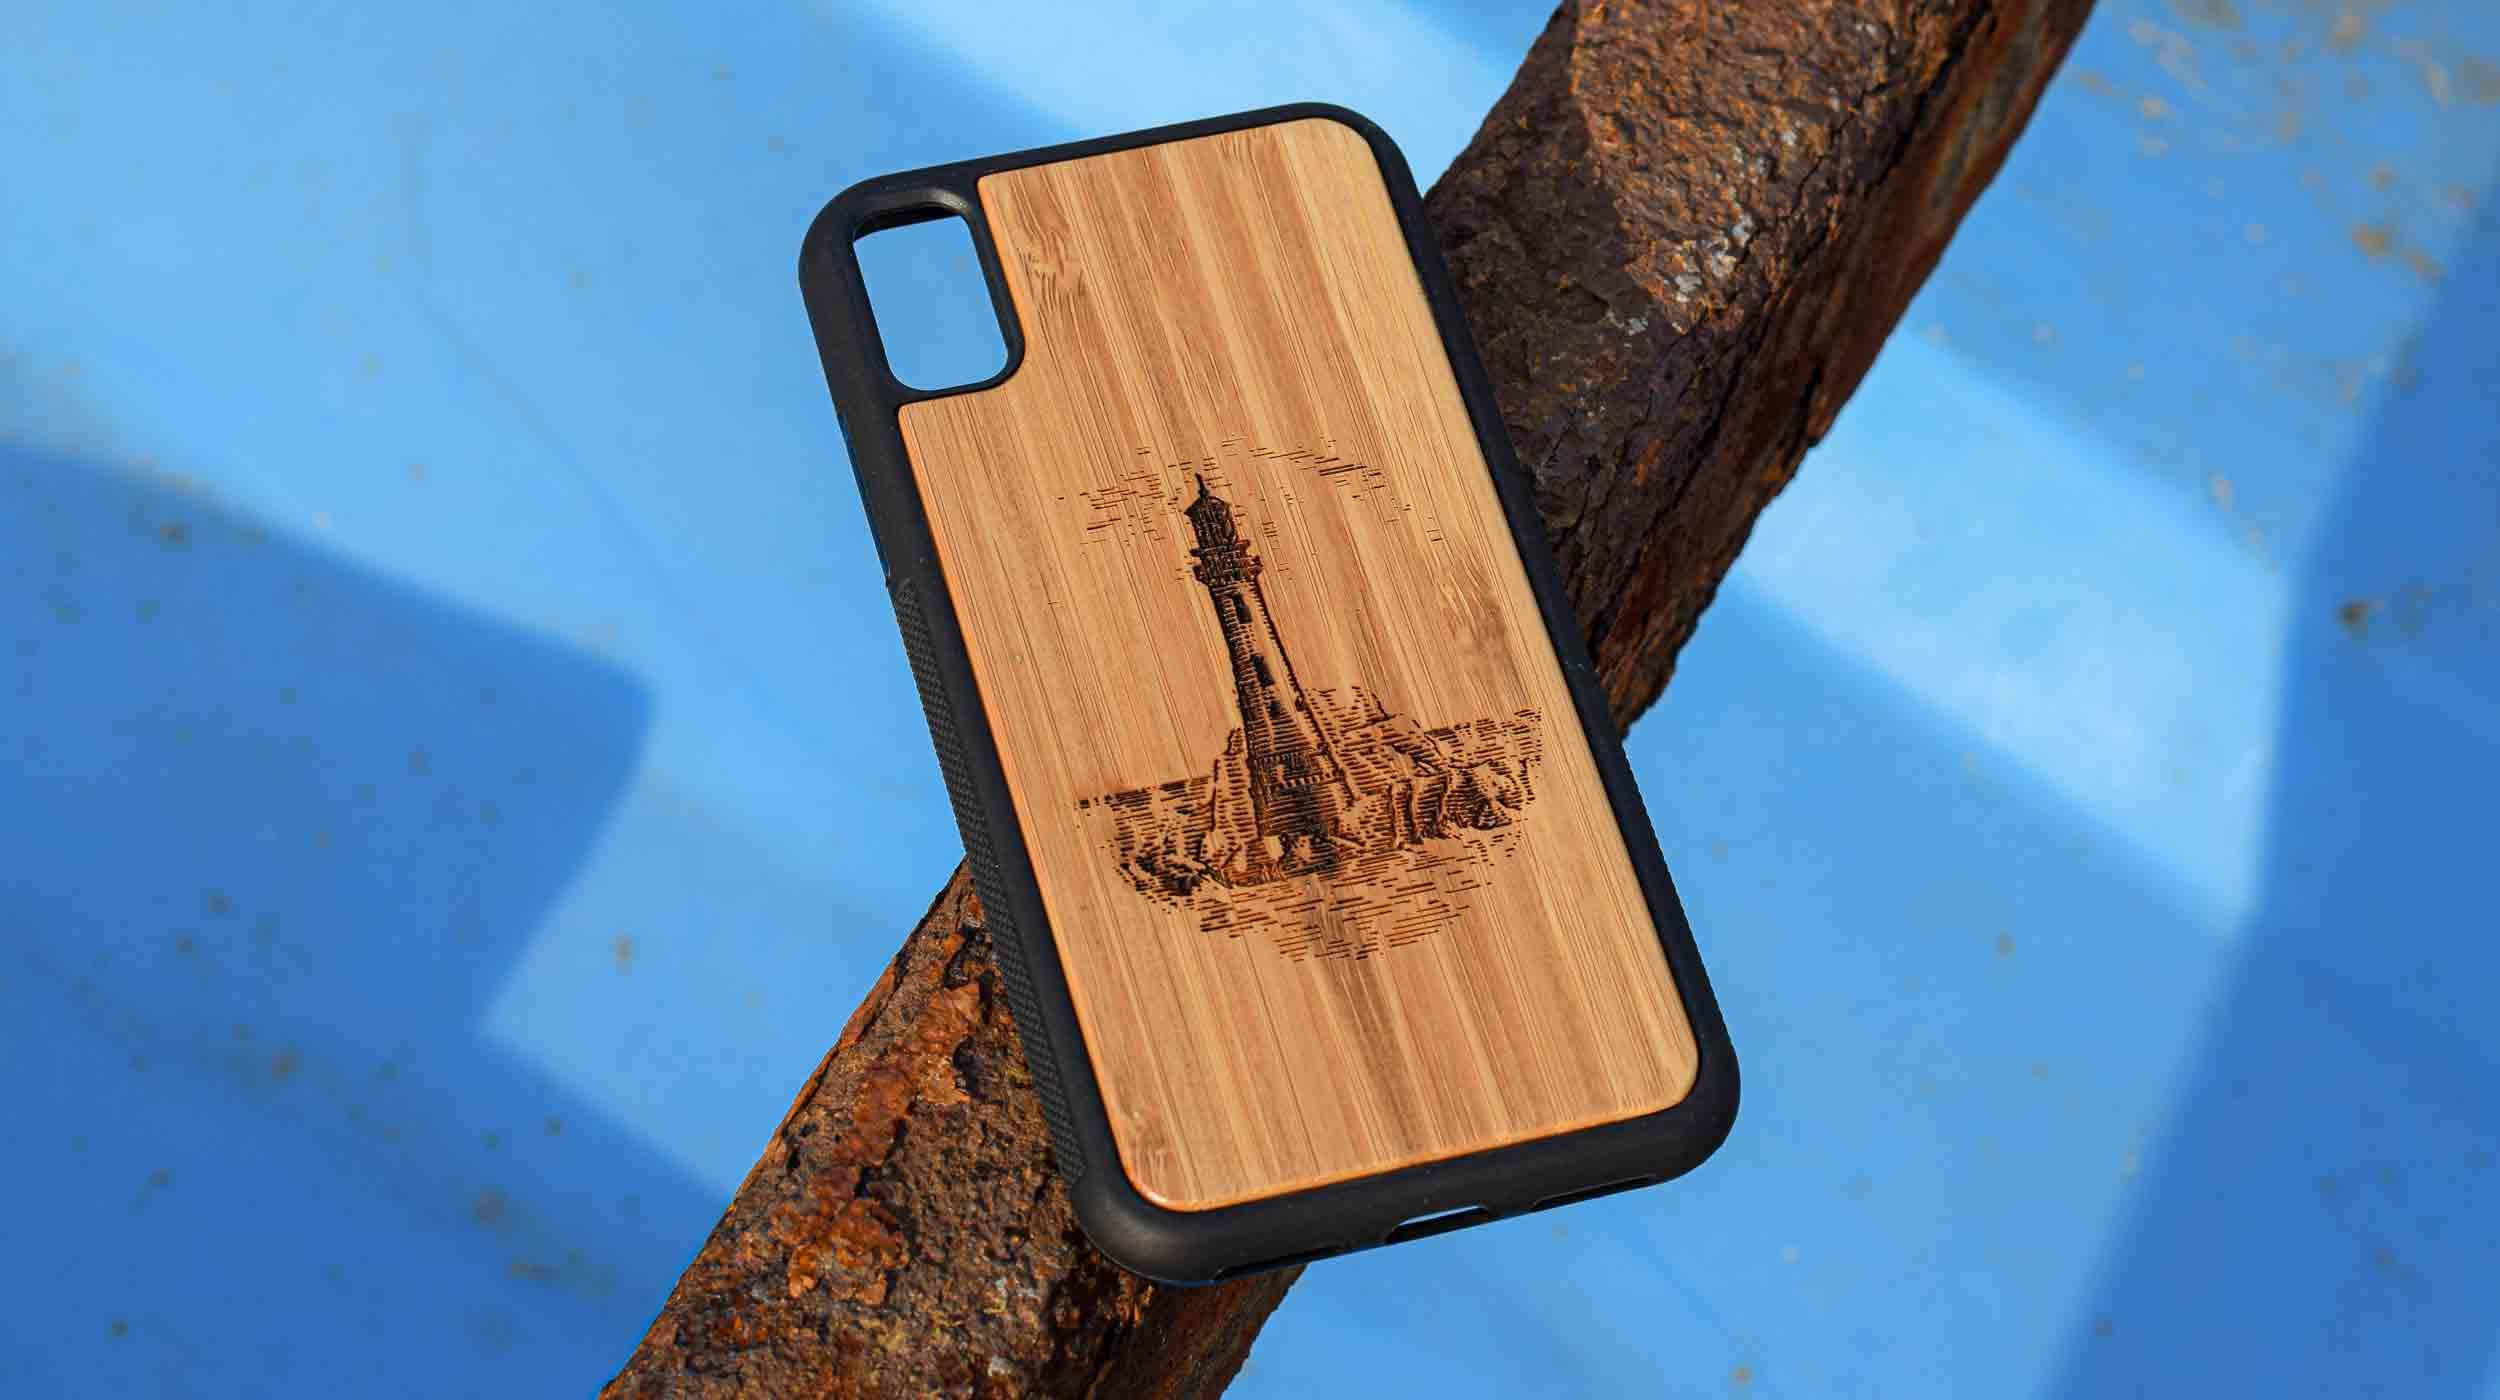 coque en bois iphone gravure phare breton apdran